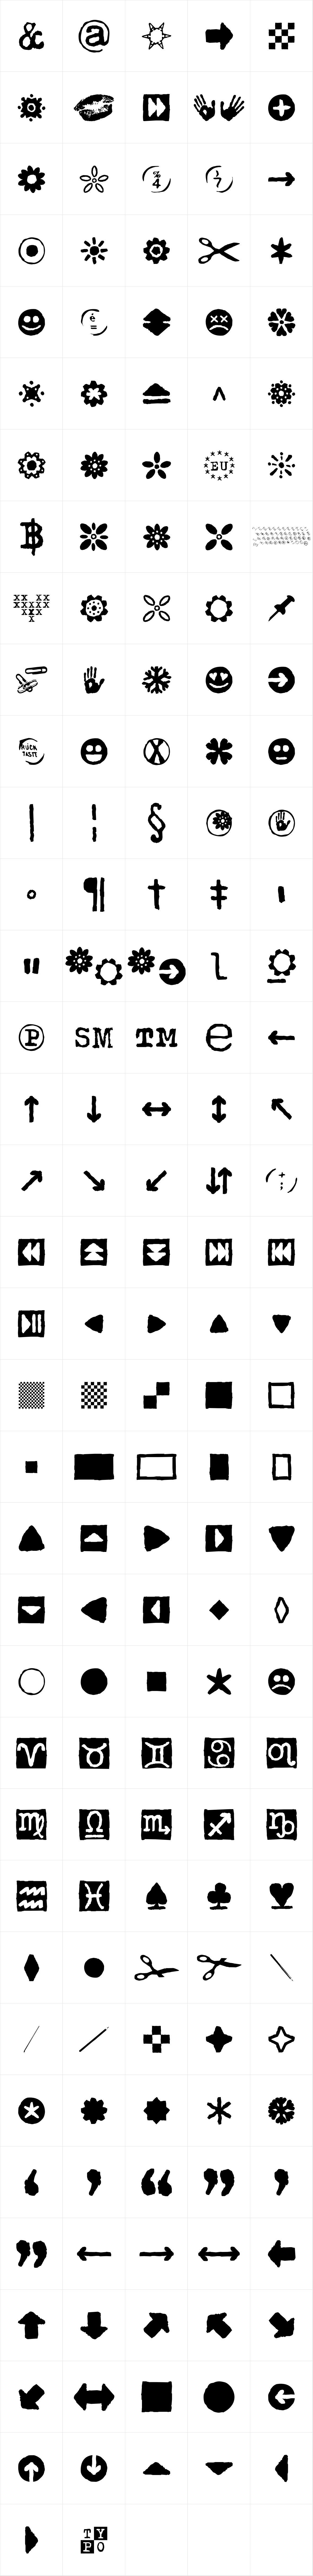 Typewriter 1950 Tech Mono Icons